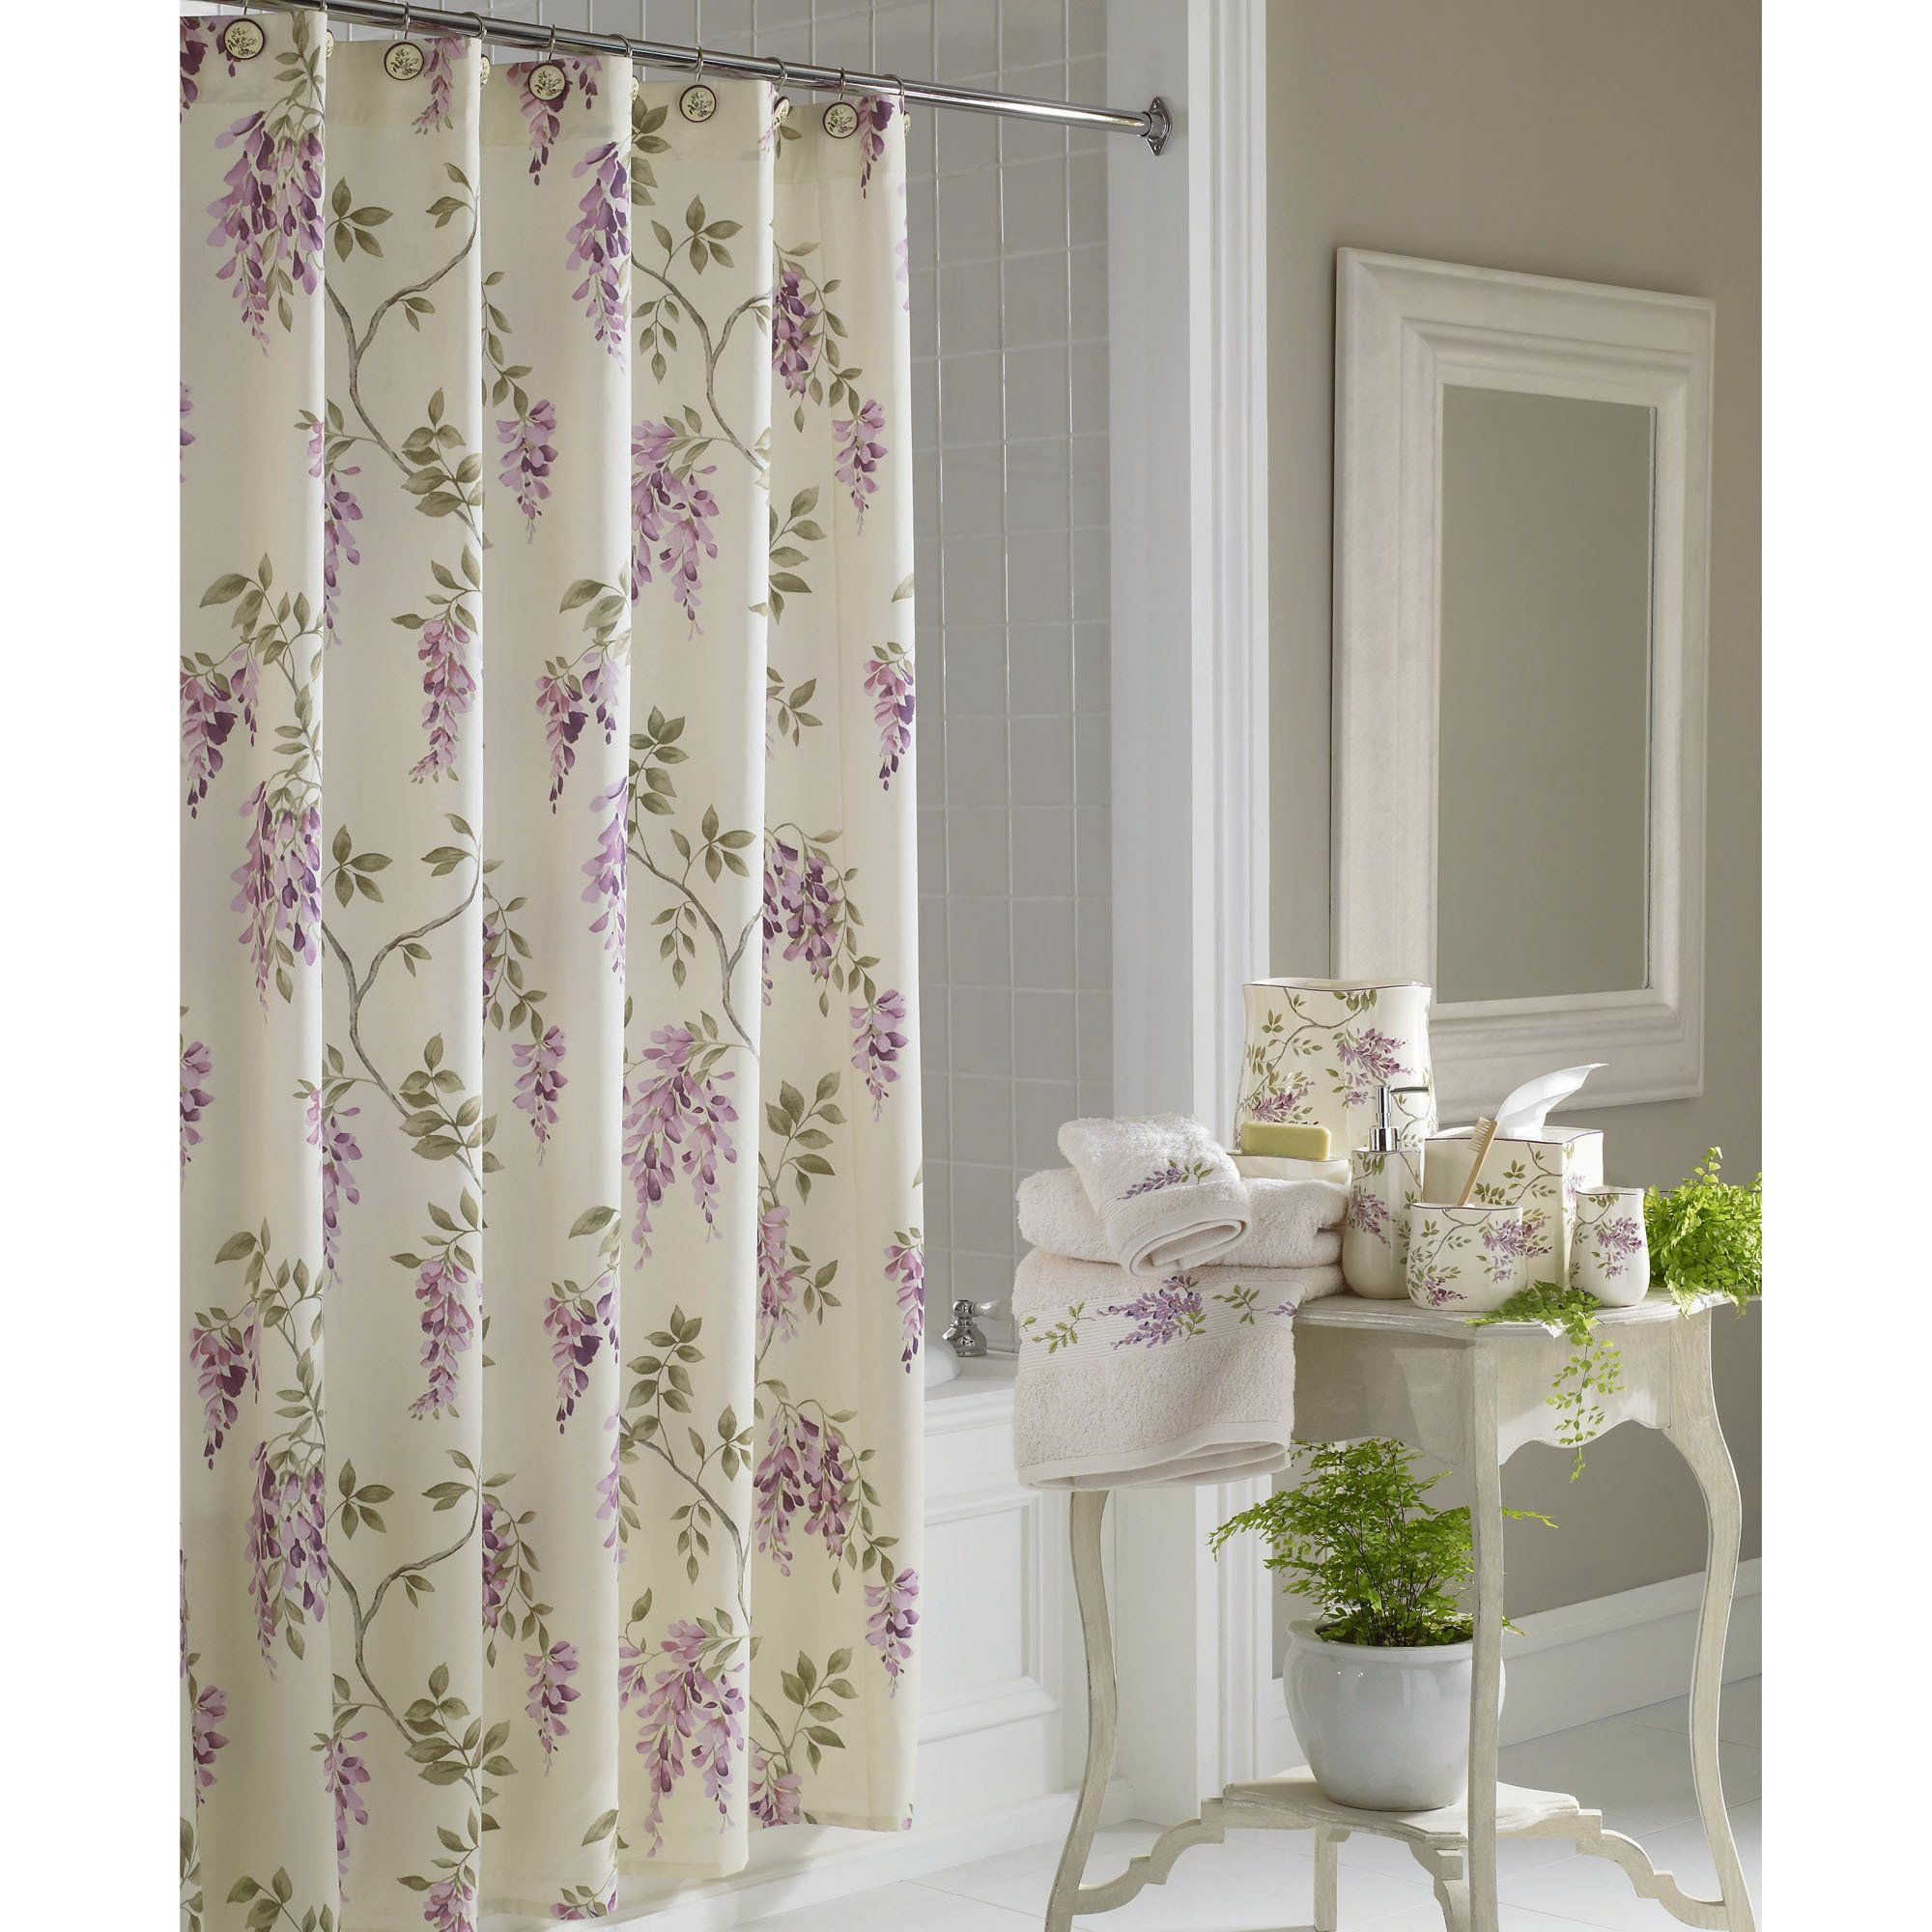 Superb Wisteria Shower Curtain Ivory